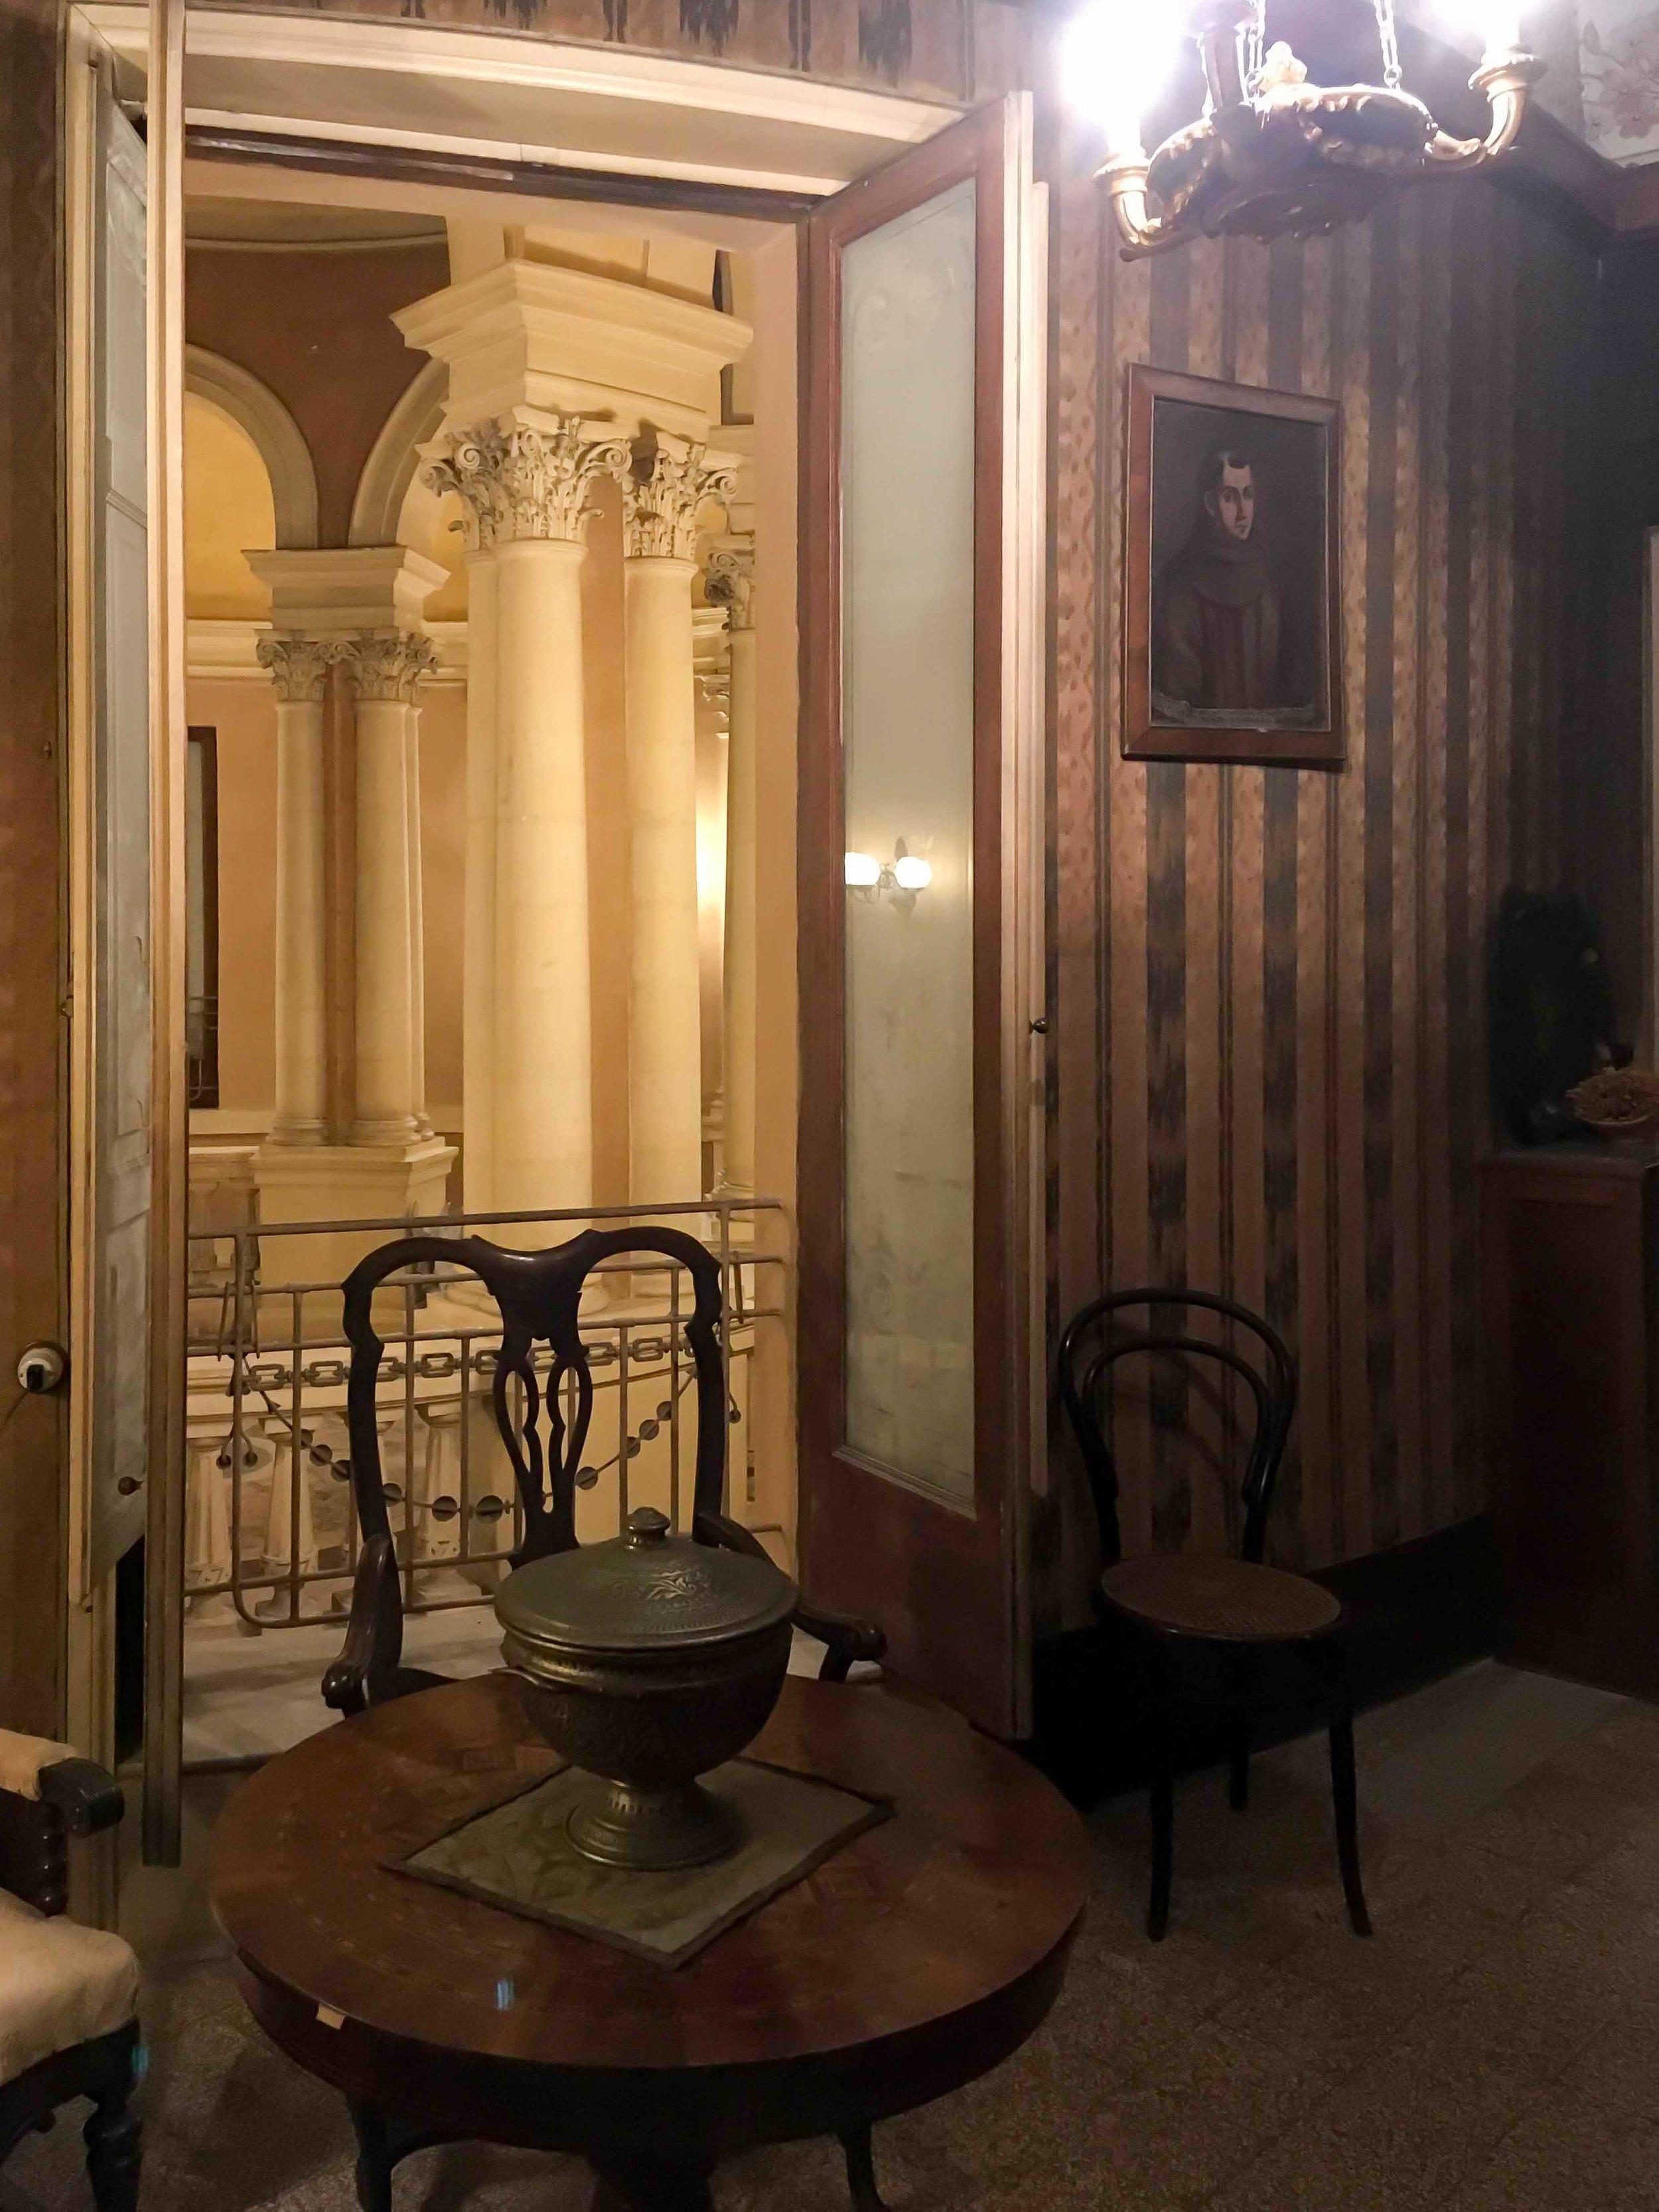 Palazzo-Tafuri-Lecce-web-6.jpg